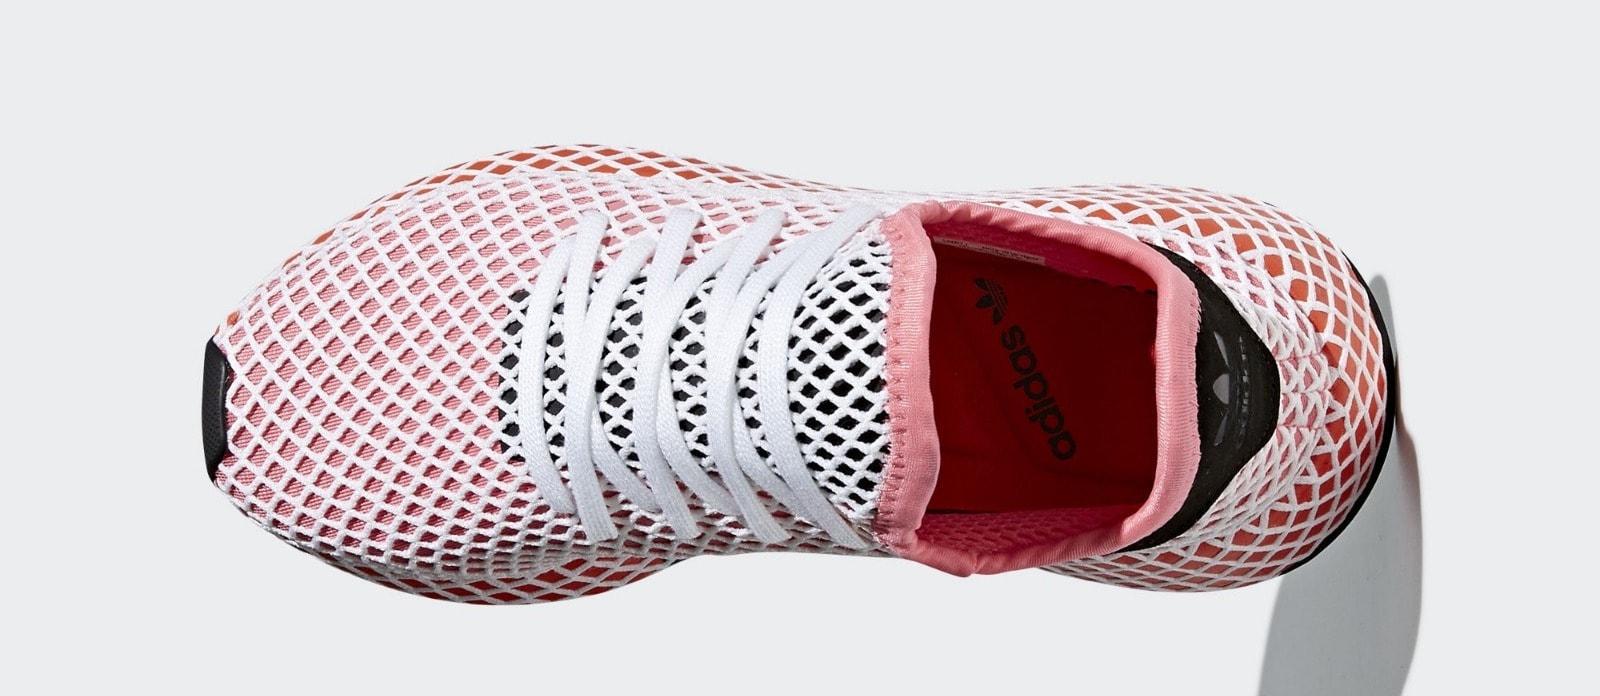 outlet store fec3a f60c9 adidas Deerupt Runner PinkOrange Release Date March 22nd, 2018. Price  100. Color Chalk PinkChalk PinkBold Orange Style Code CQ2910